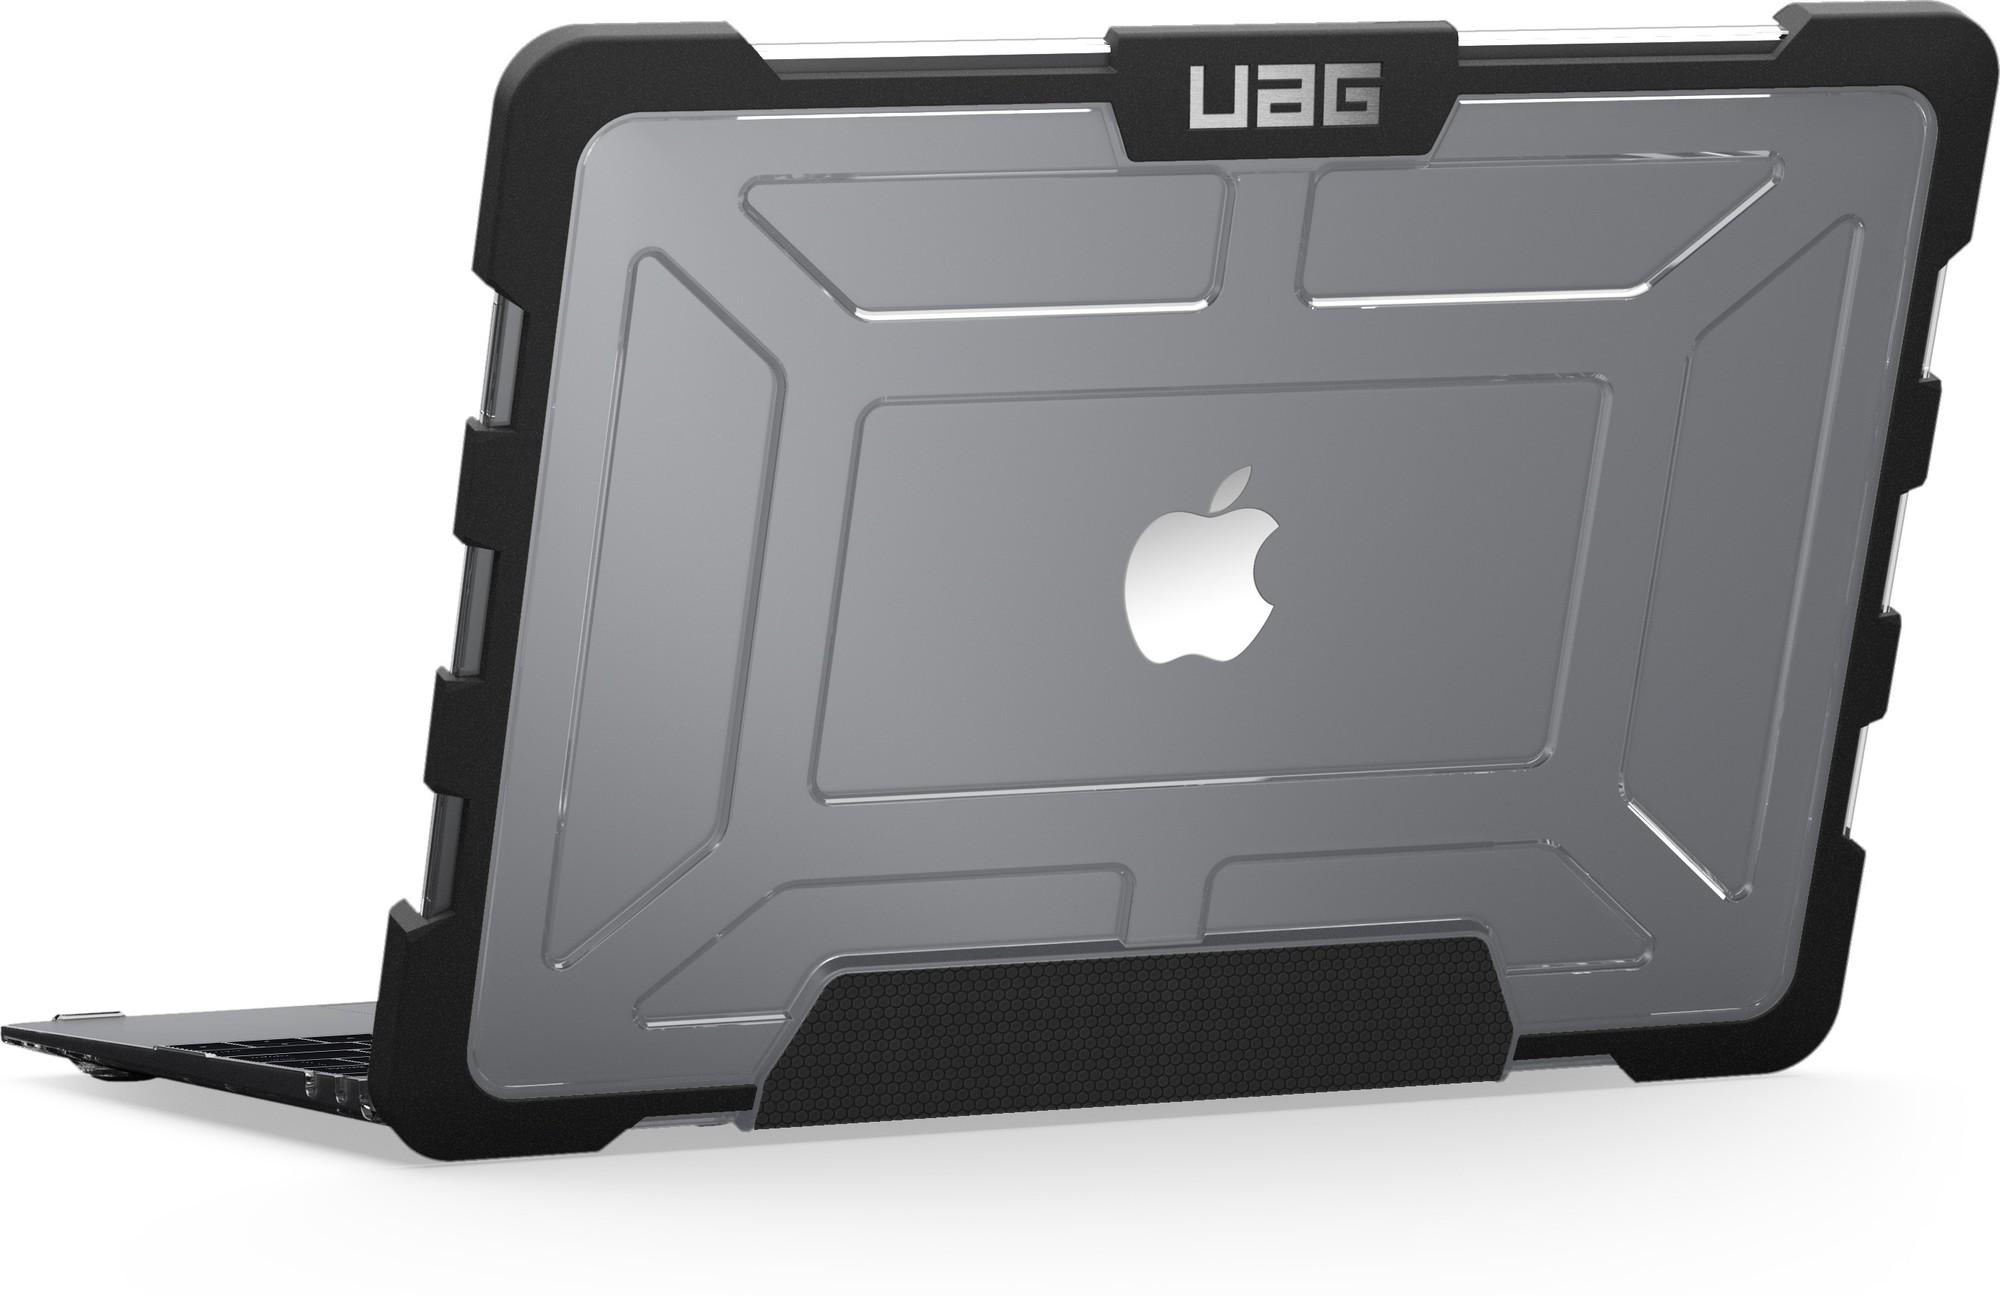 MacBook 12 inch Ice